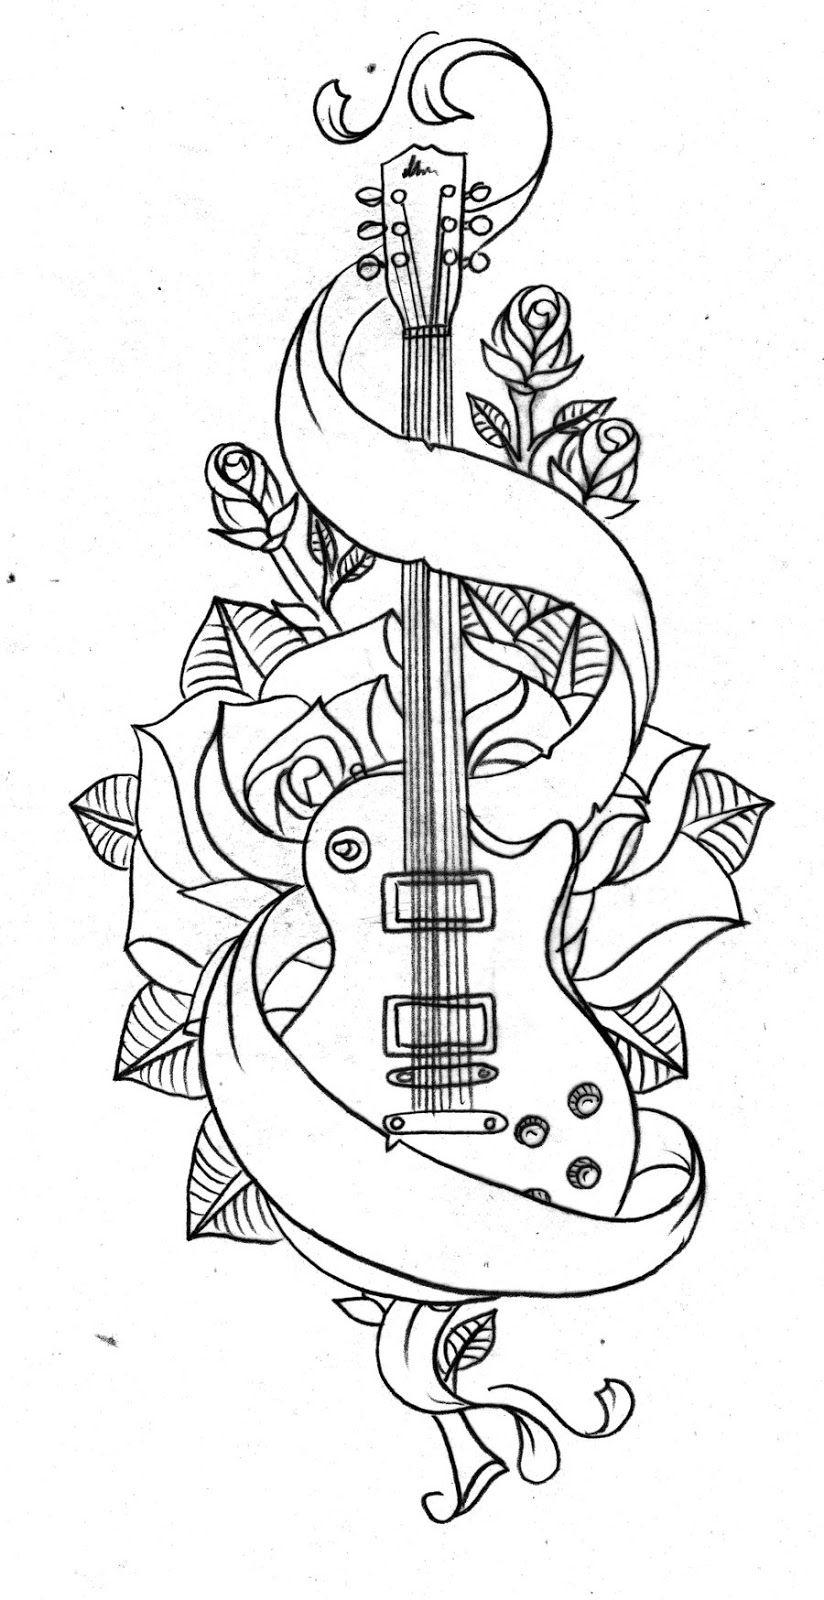 Tattoo designs coloring book - Music Tattoo Design Guitar Tattoos